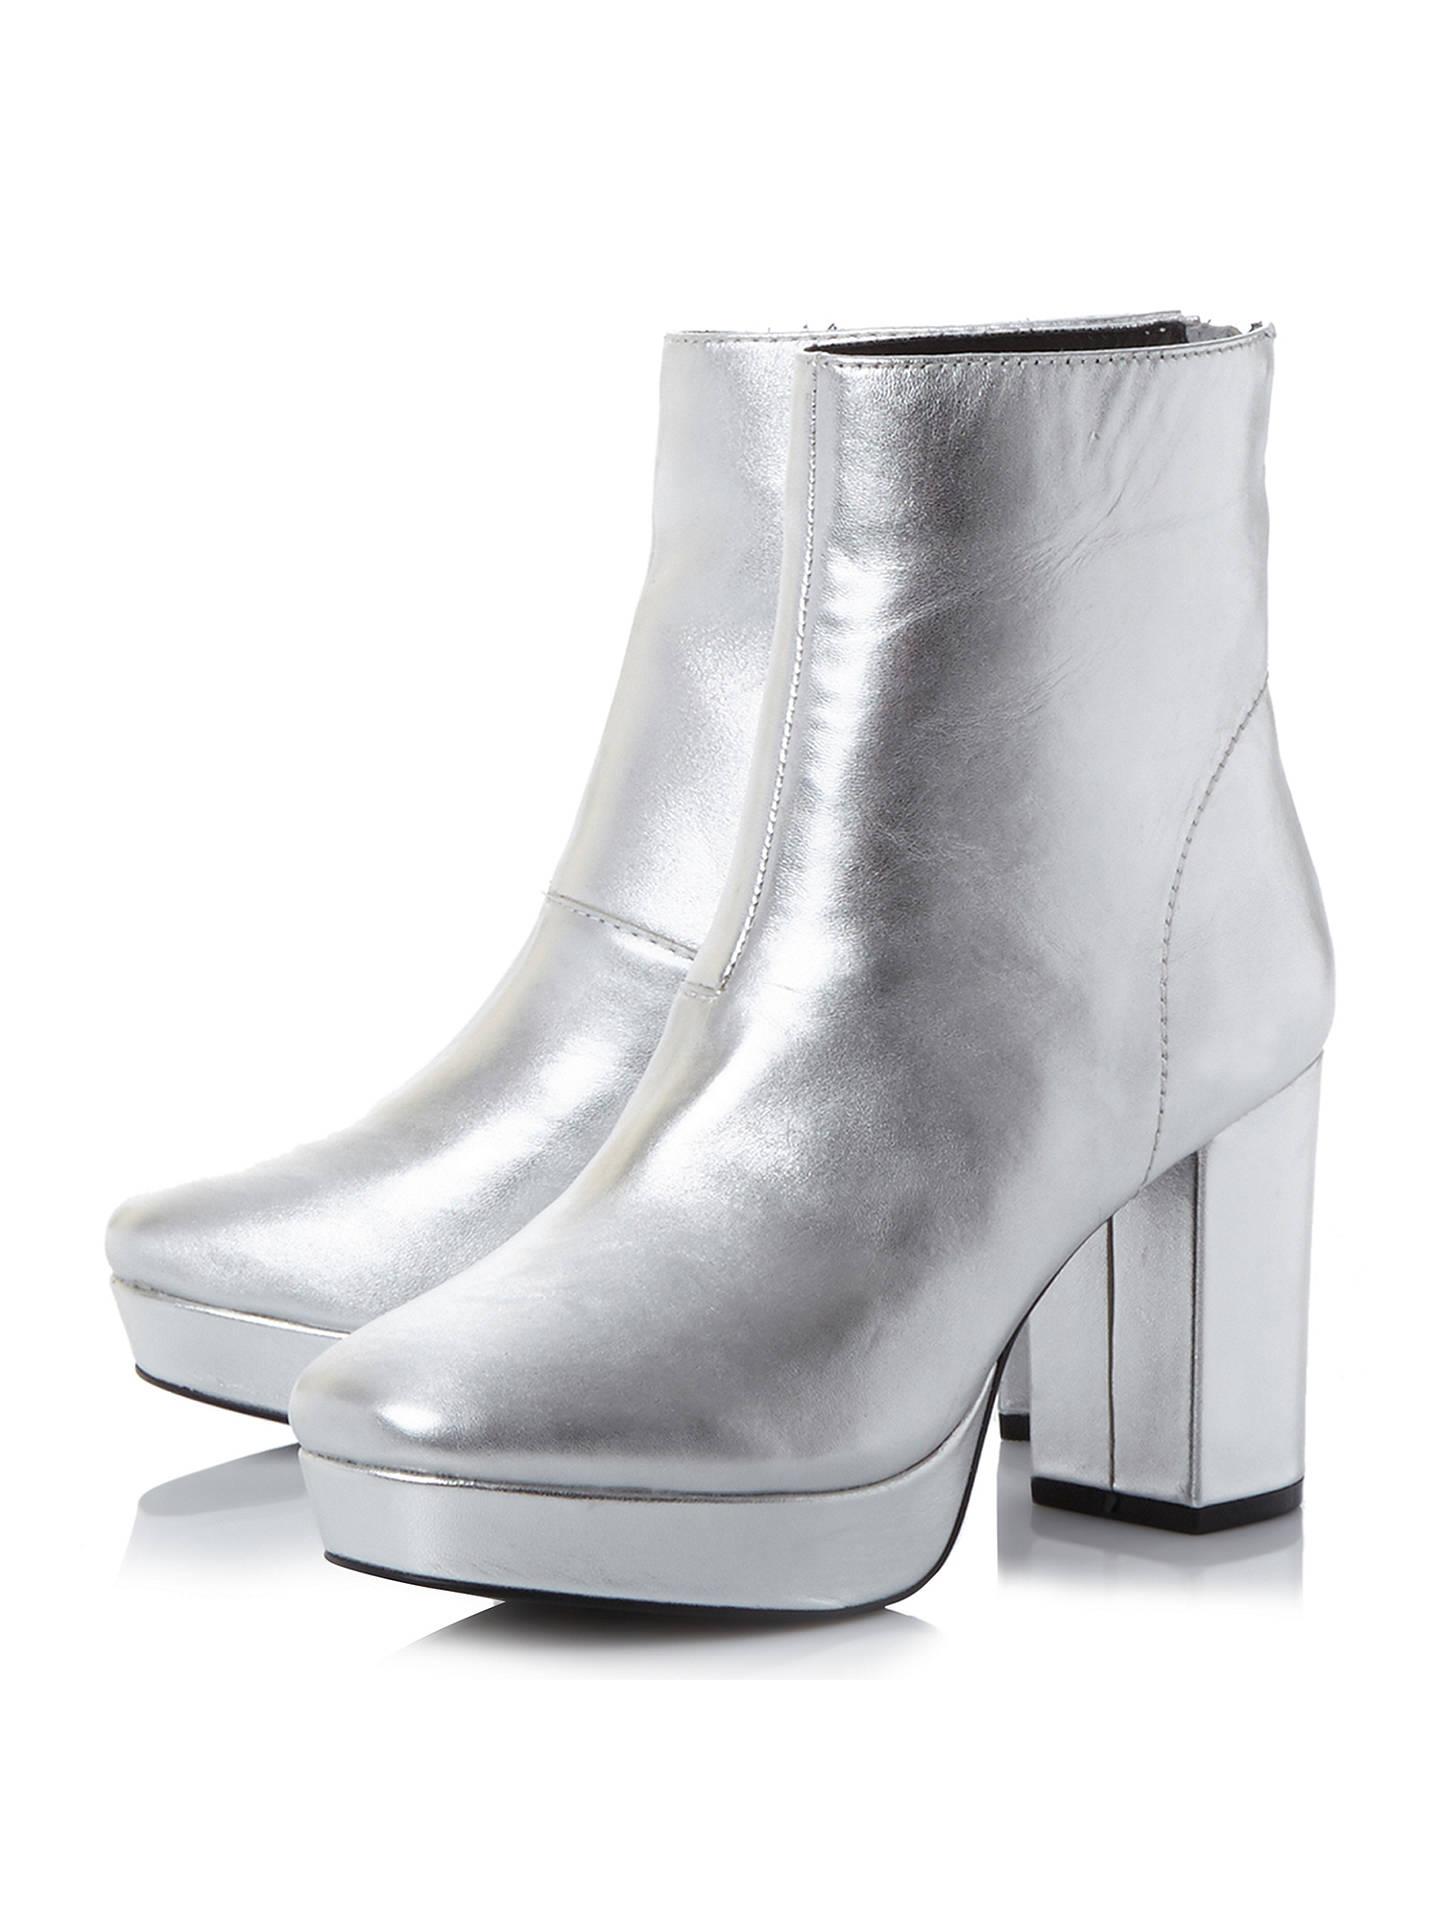 867123b56e4 Steve Madden Peace Platform Block Heeled Ankle Boots at John Lewis ...